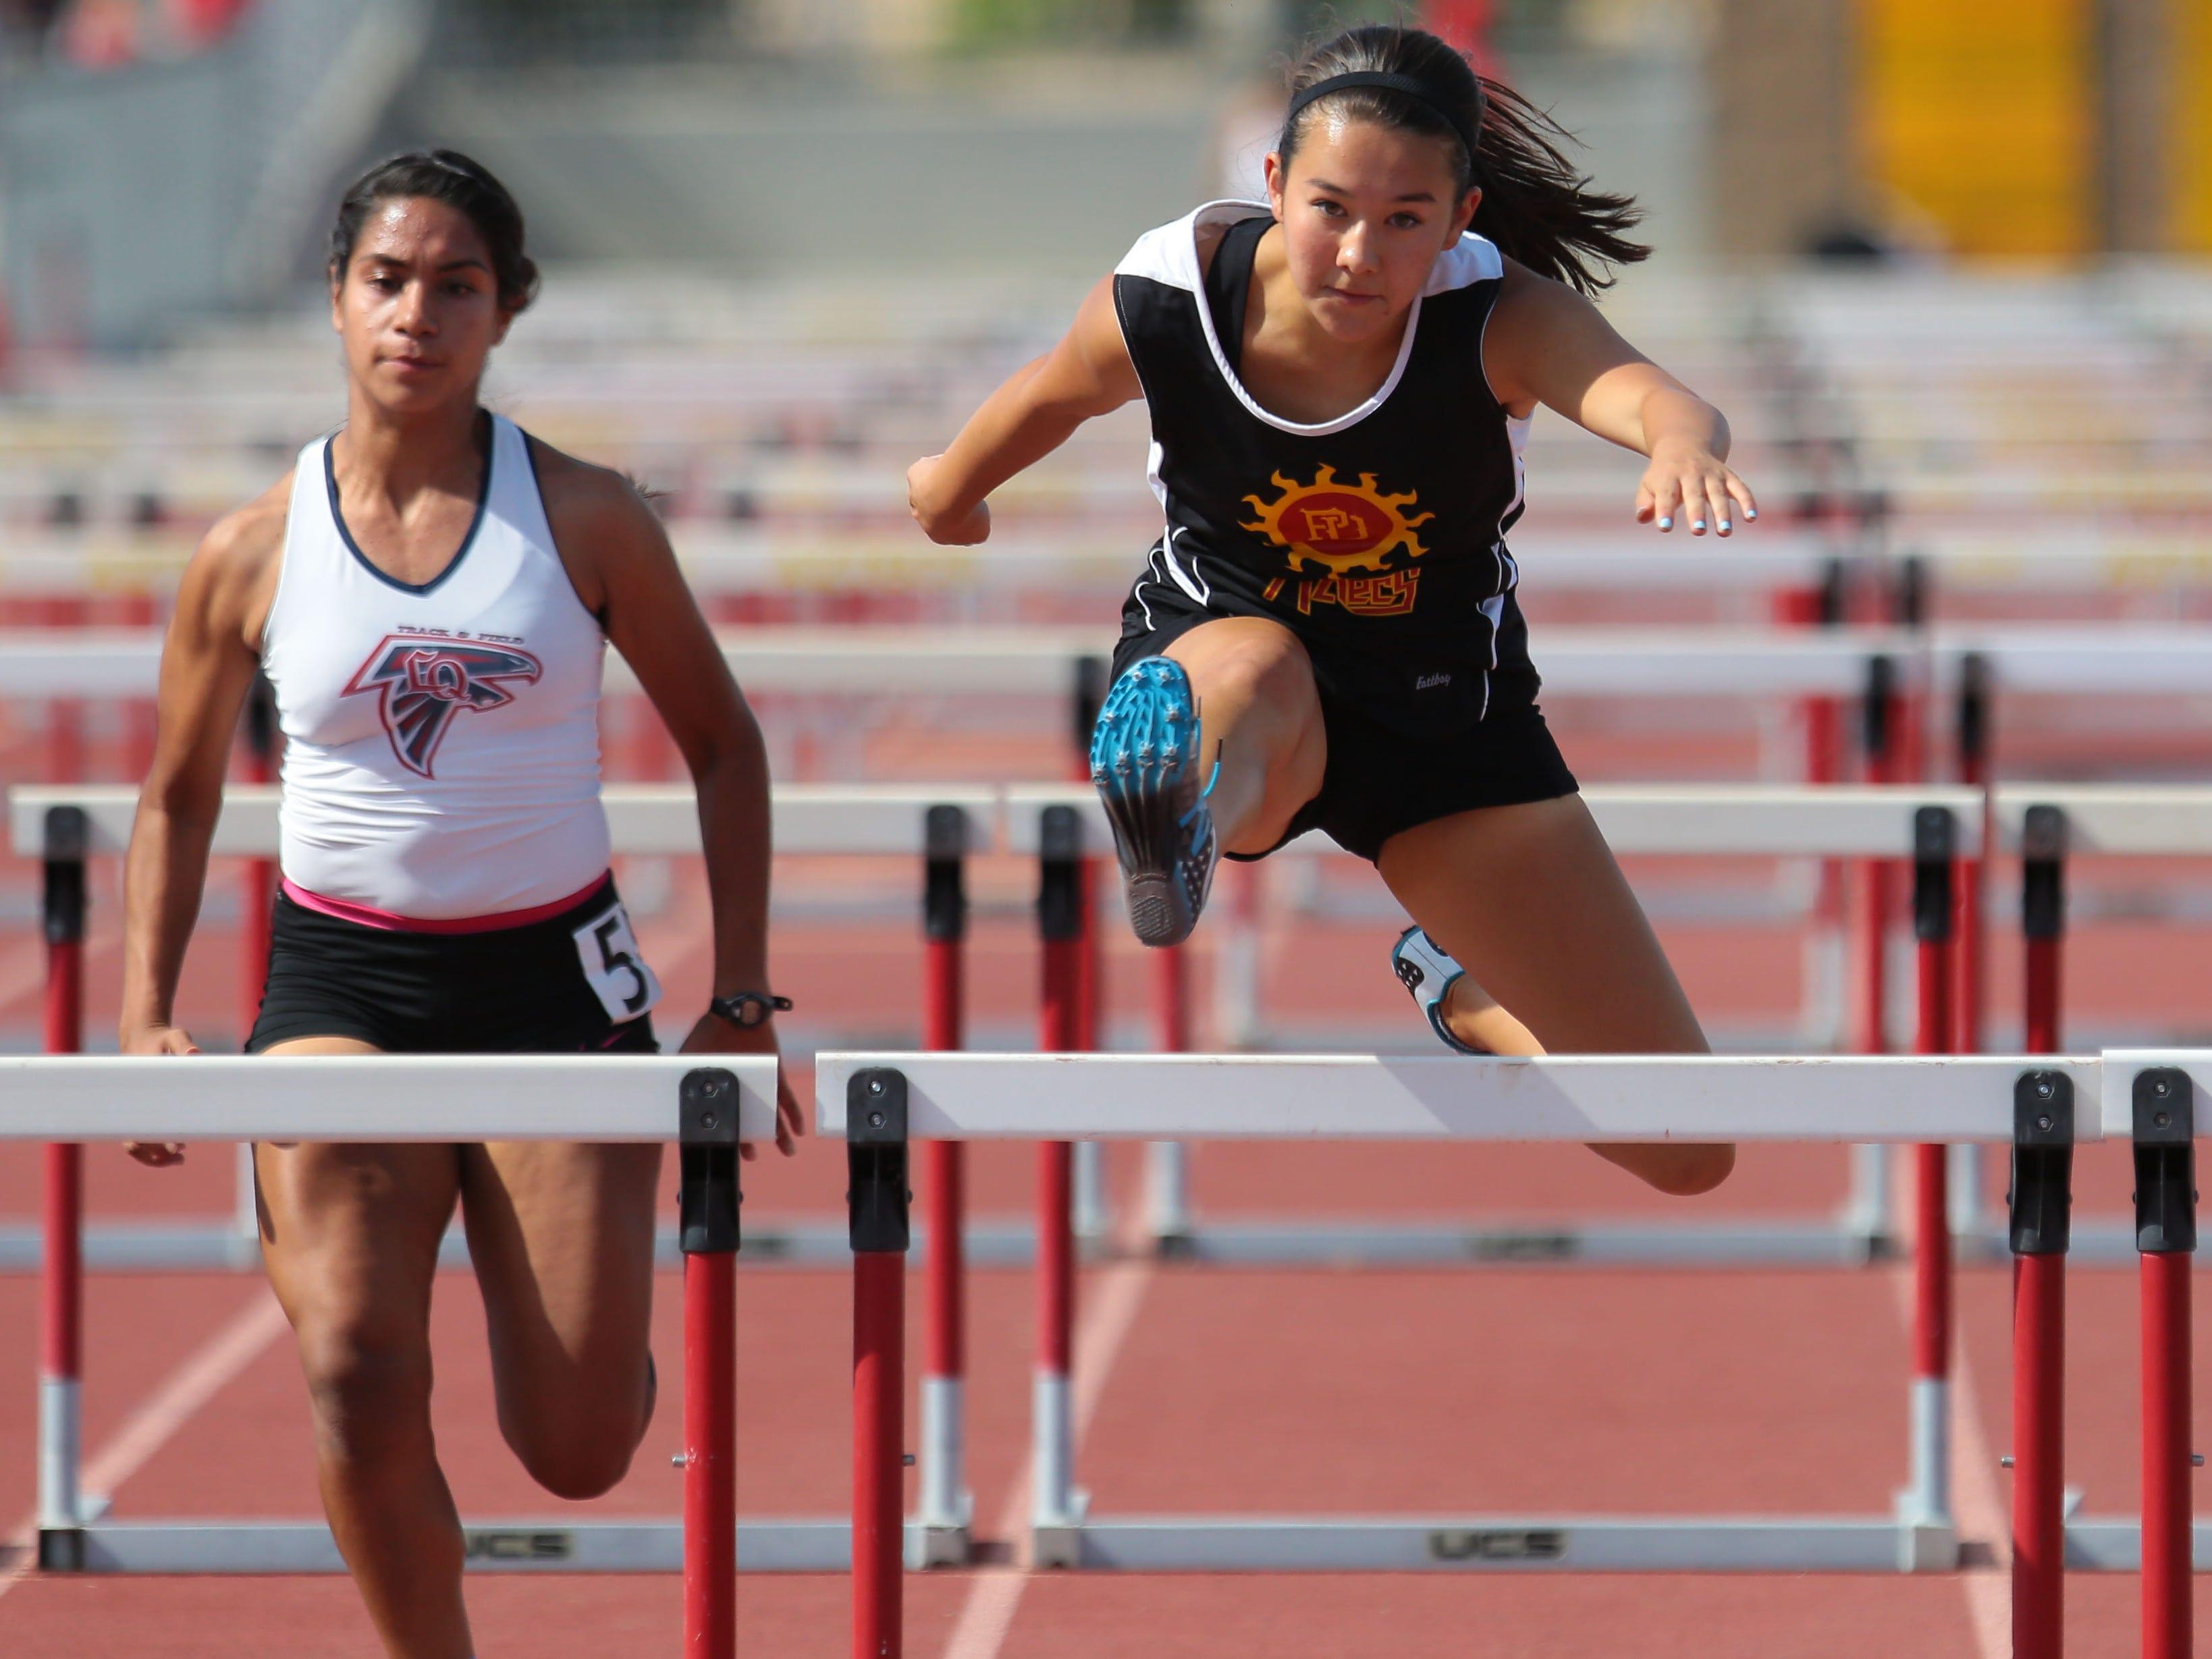 Palm Desert's Kira Leggat jumps her last hurdle for a first place finish in the 100 hurdles on Thursday in Palm Desert.